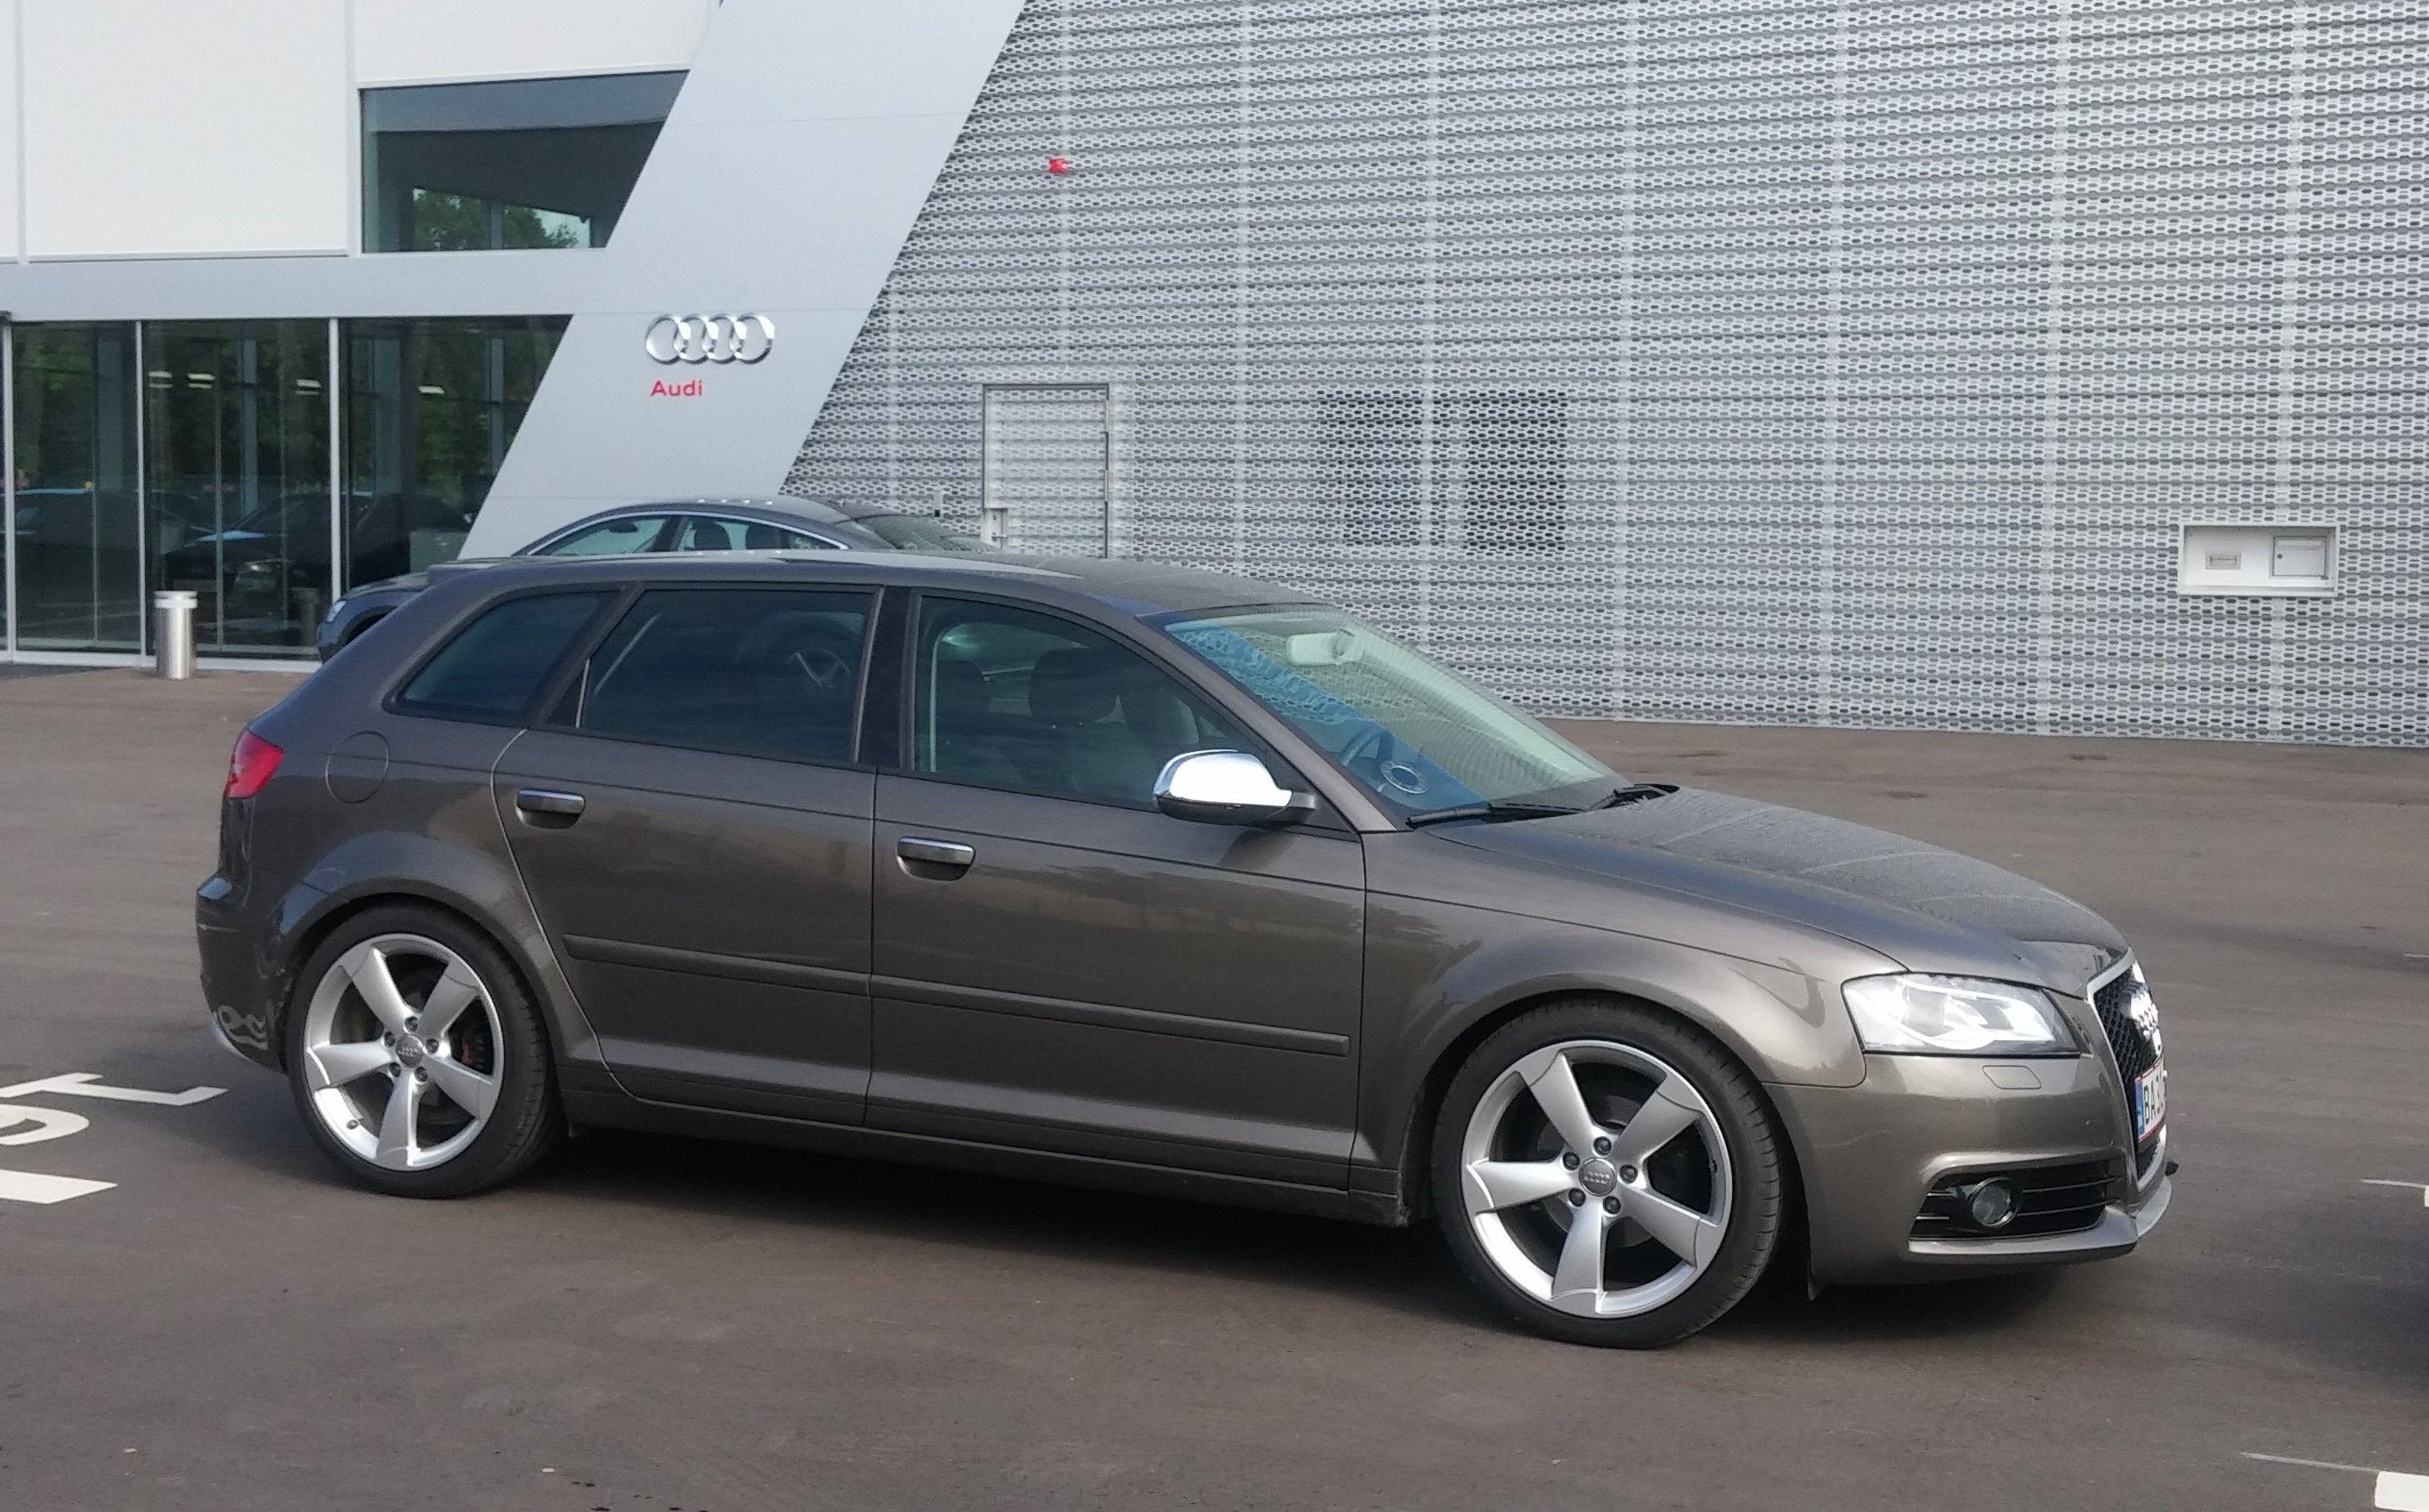 Audi at Audis.jpg